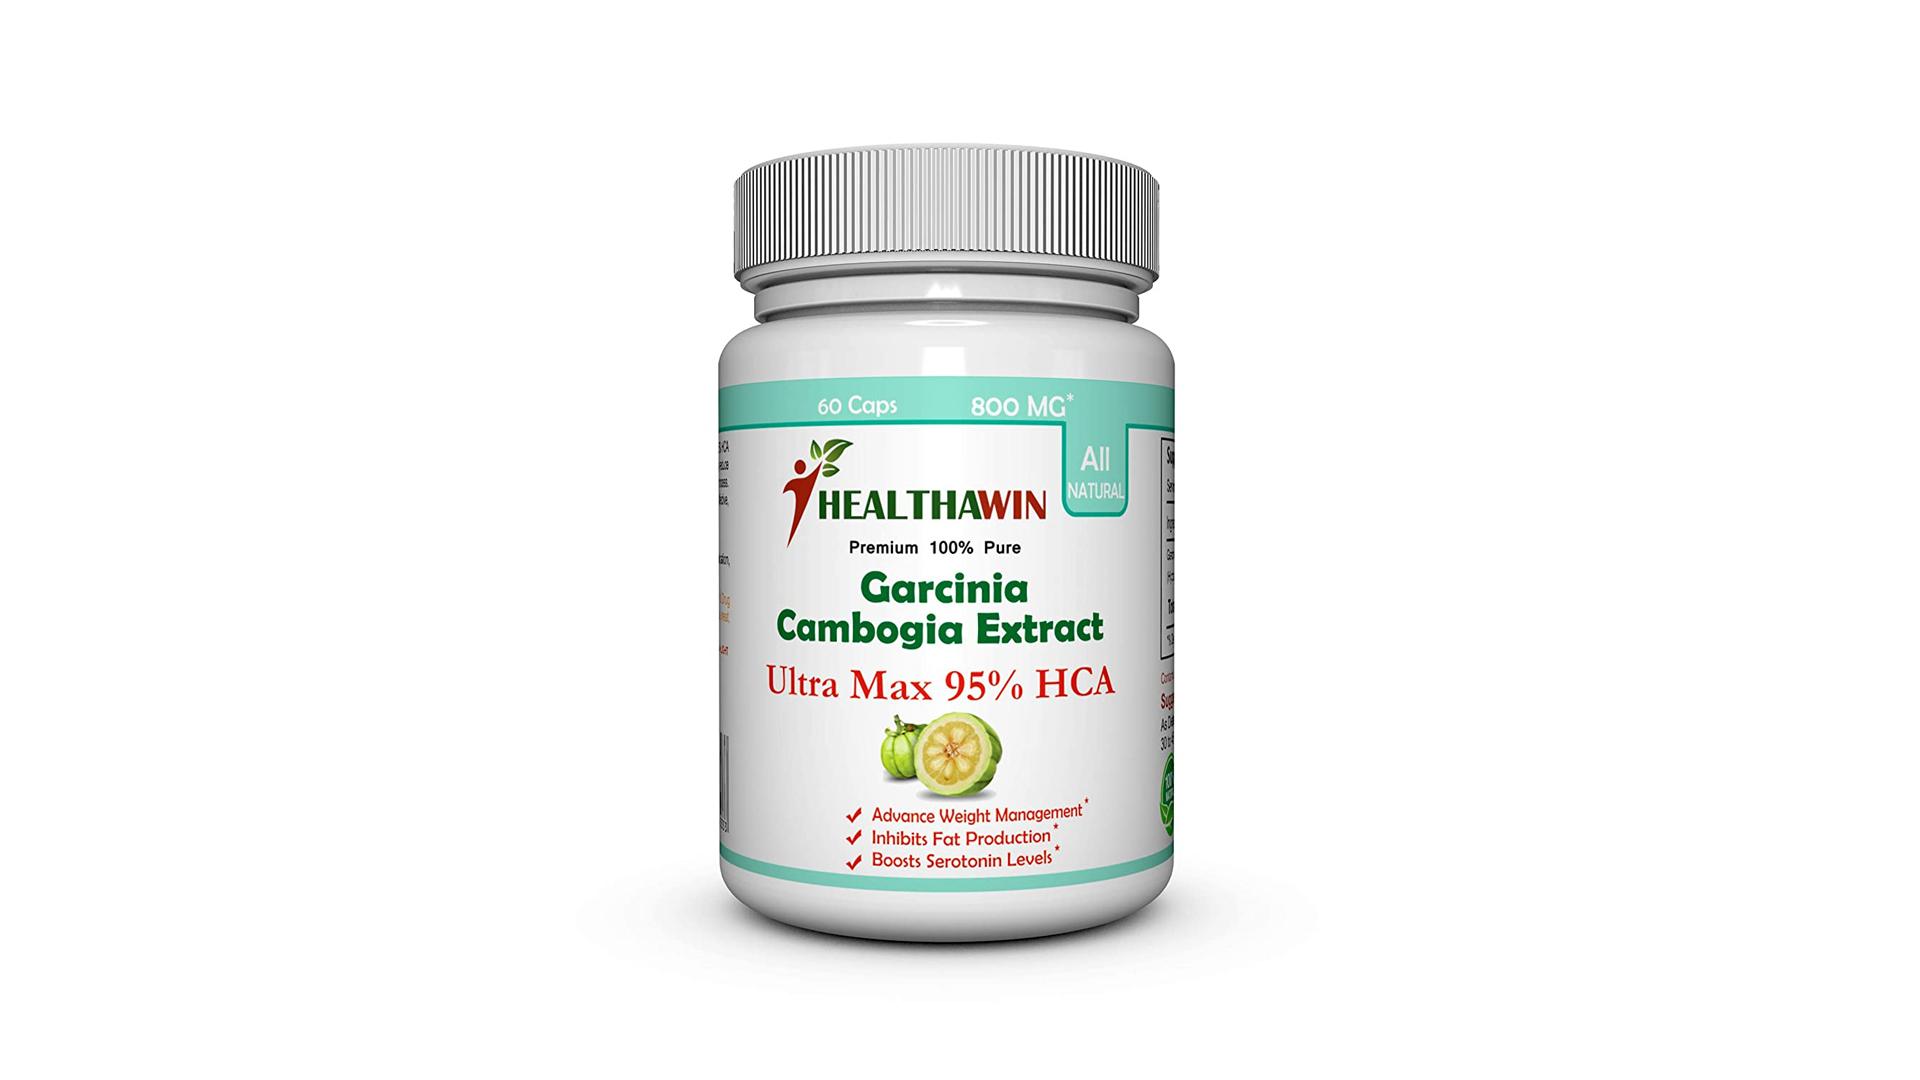 Healthawin Pure Garcinia Cambogia